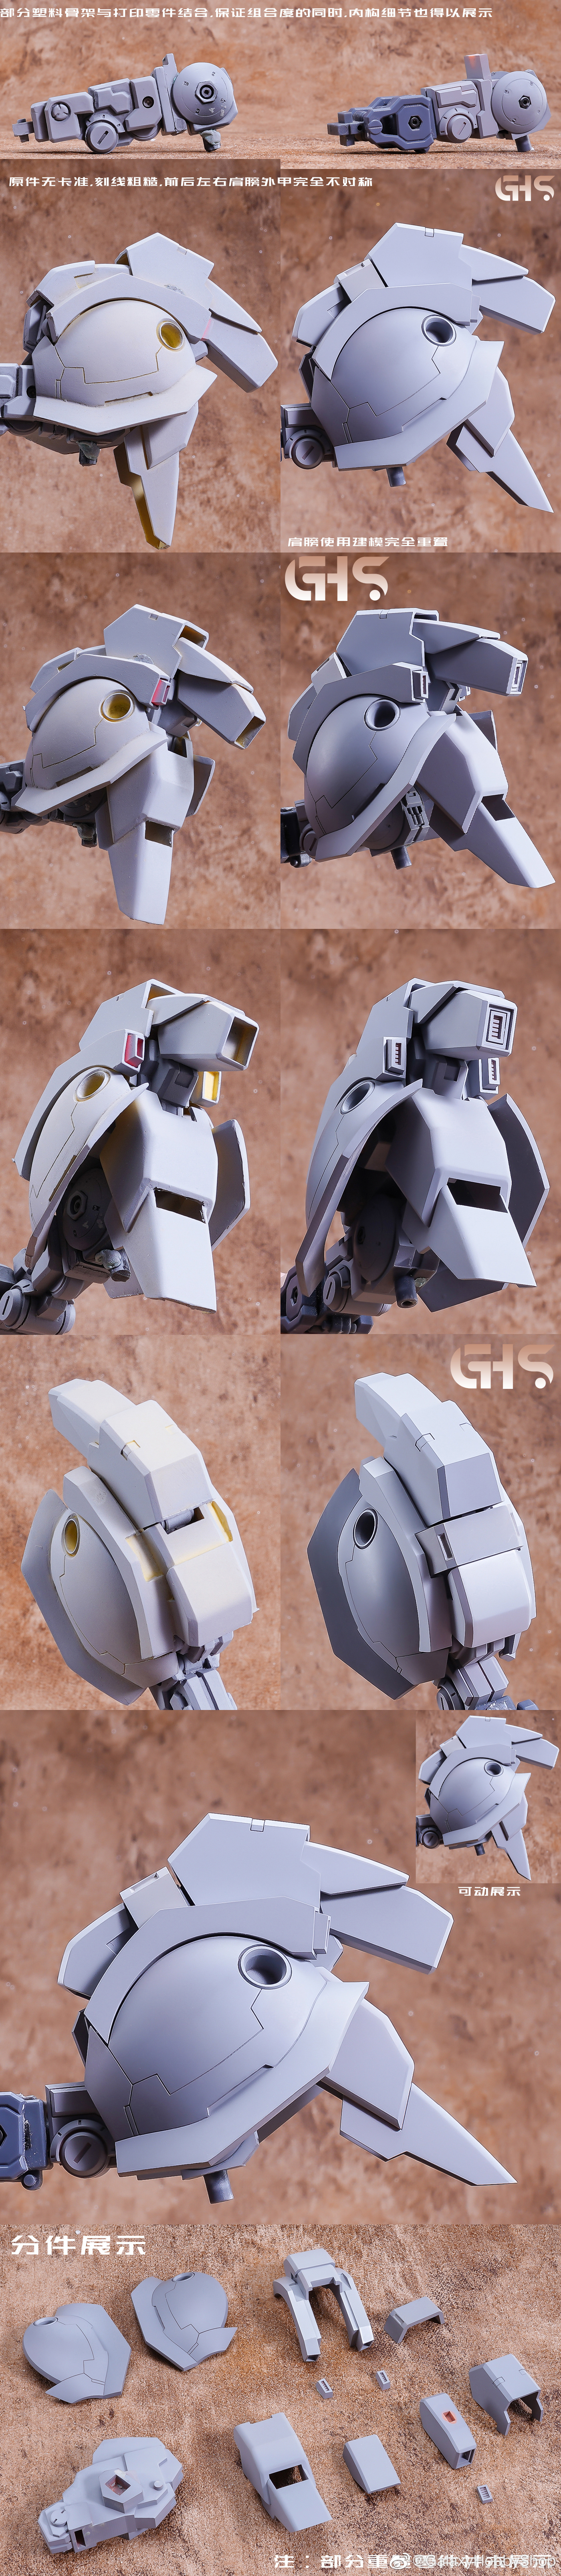 G871_GS_GSH_the_o_GK_018.jpg